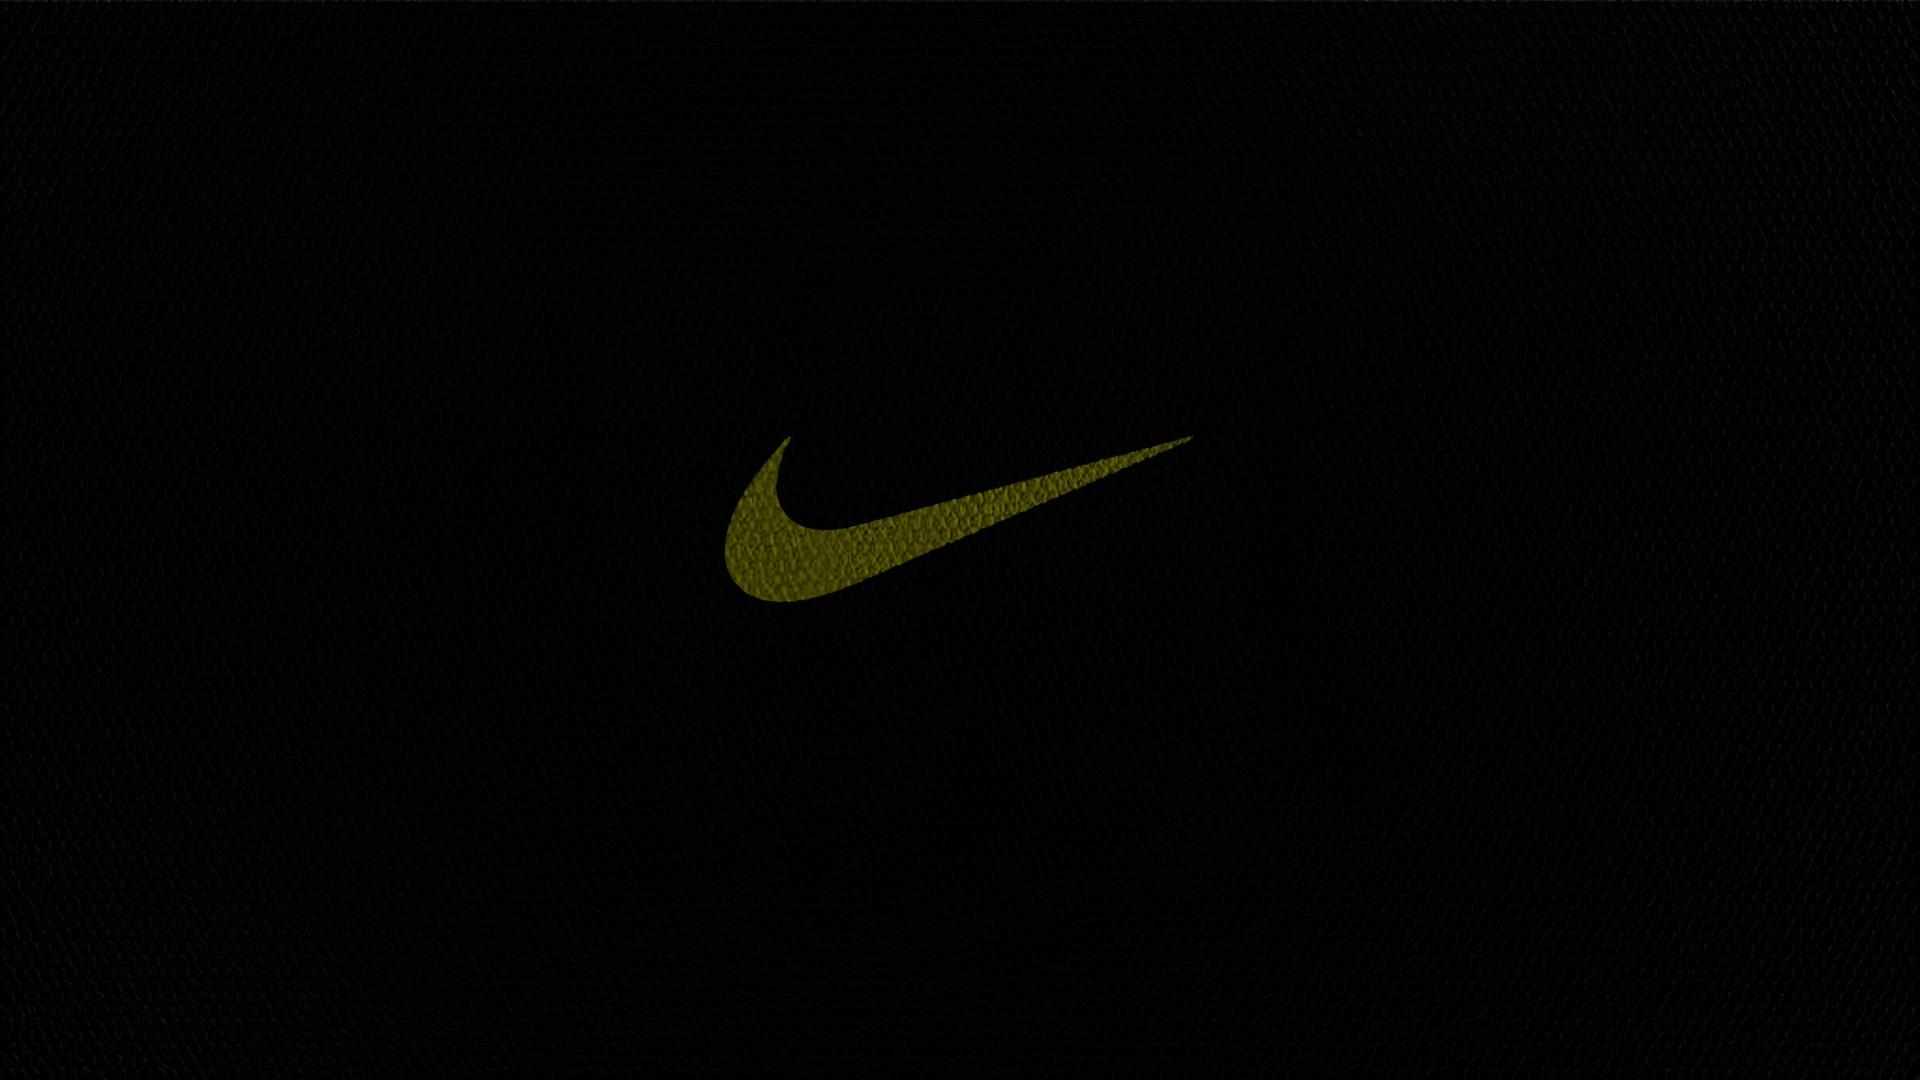 Awesome Nike Wallpaper 6772792 1920x1080